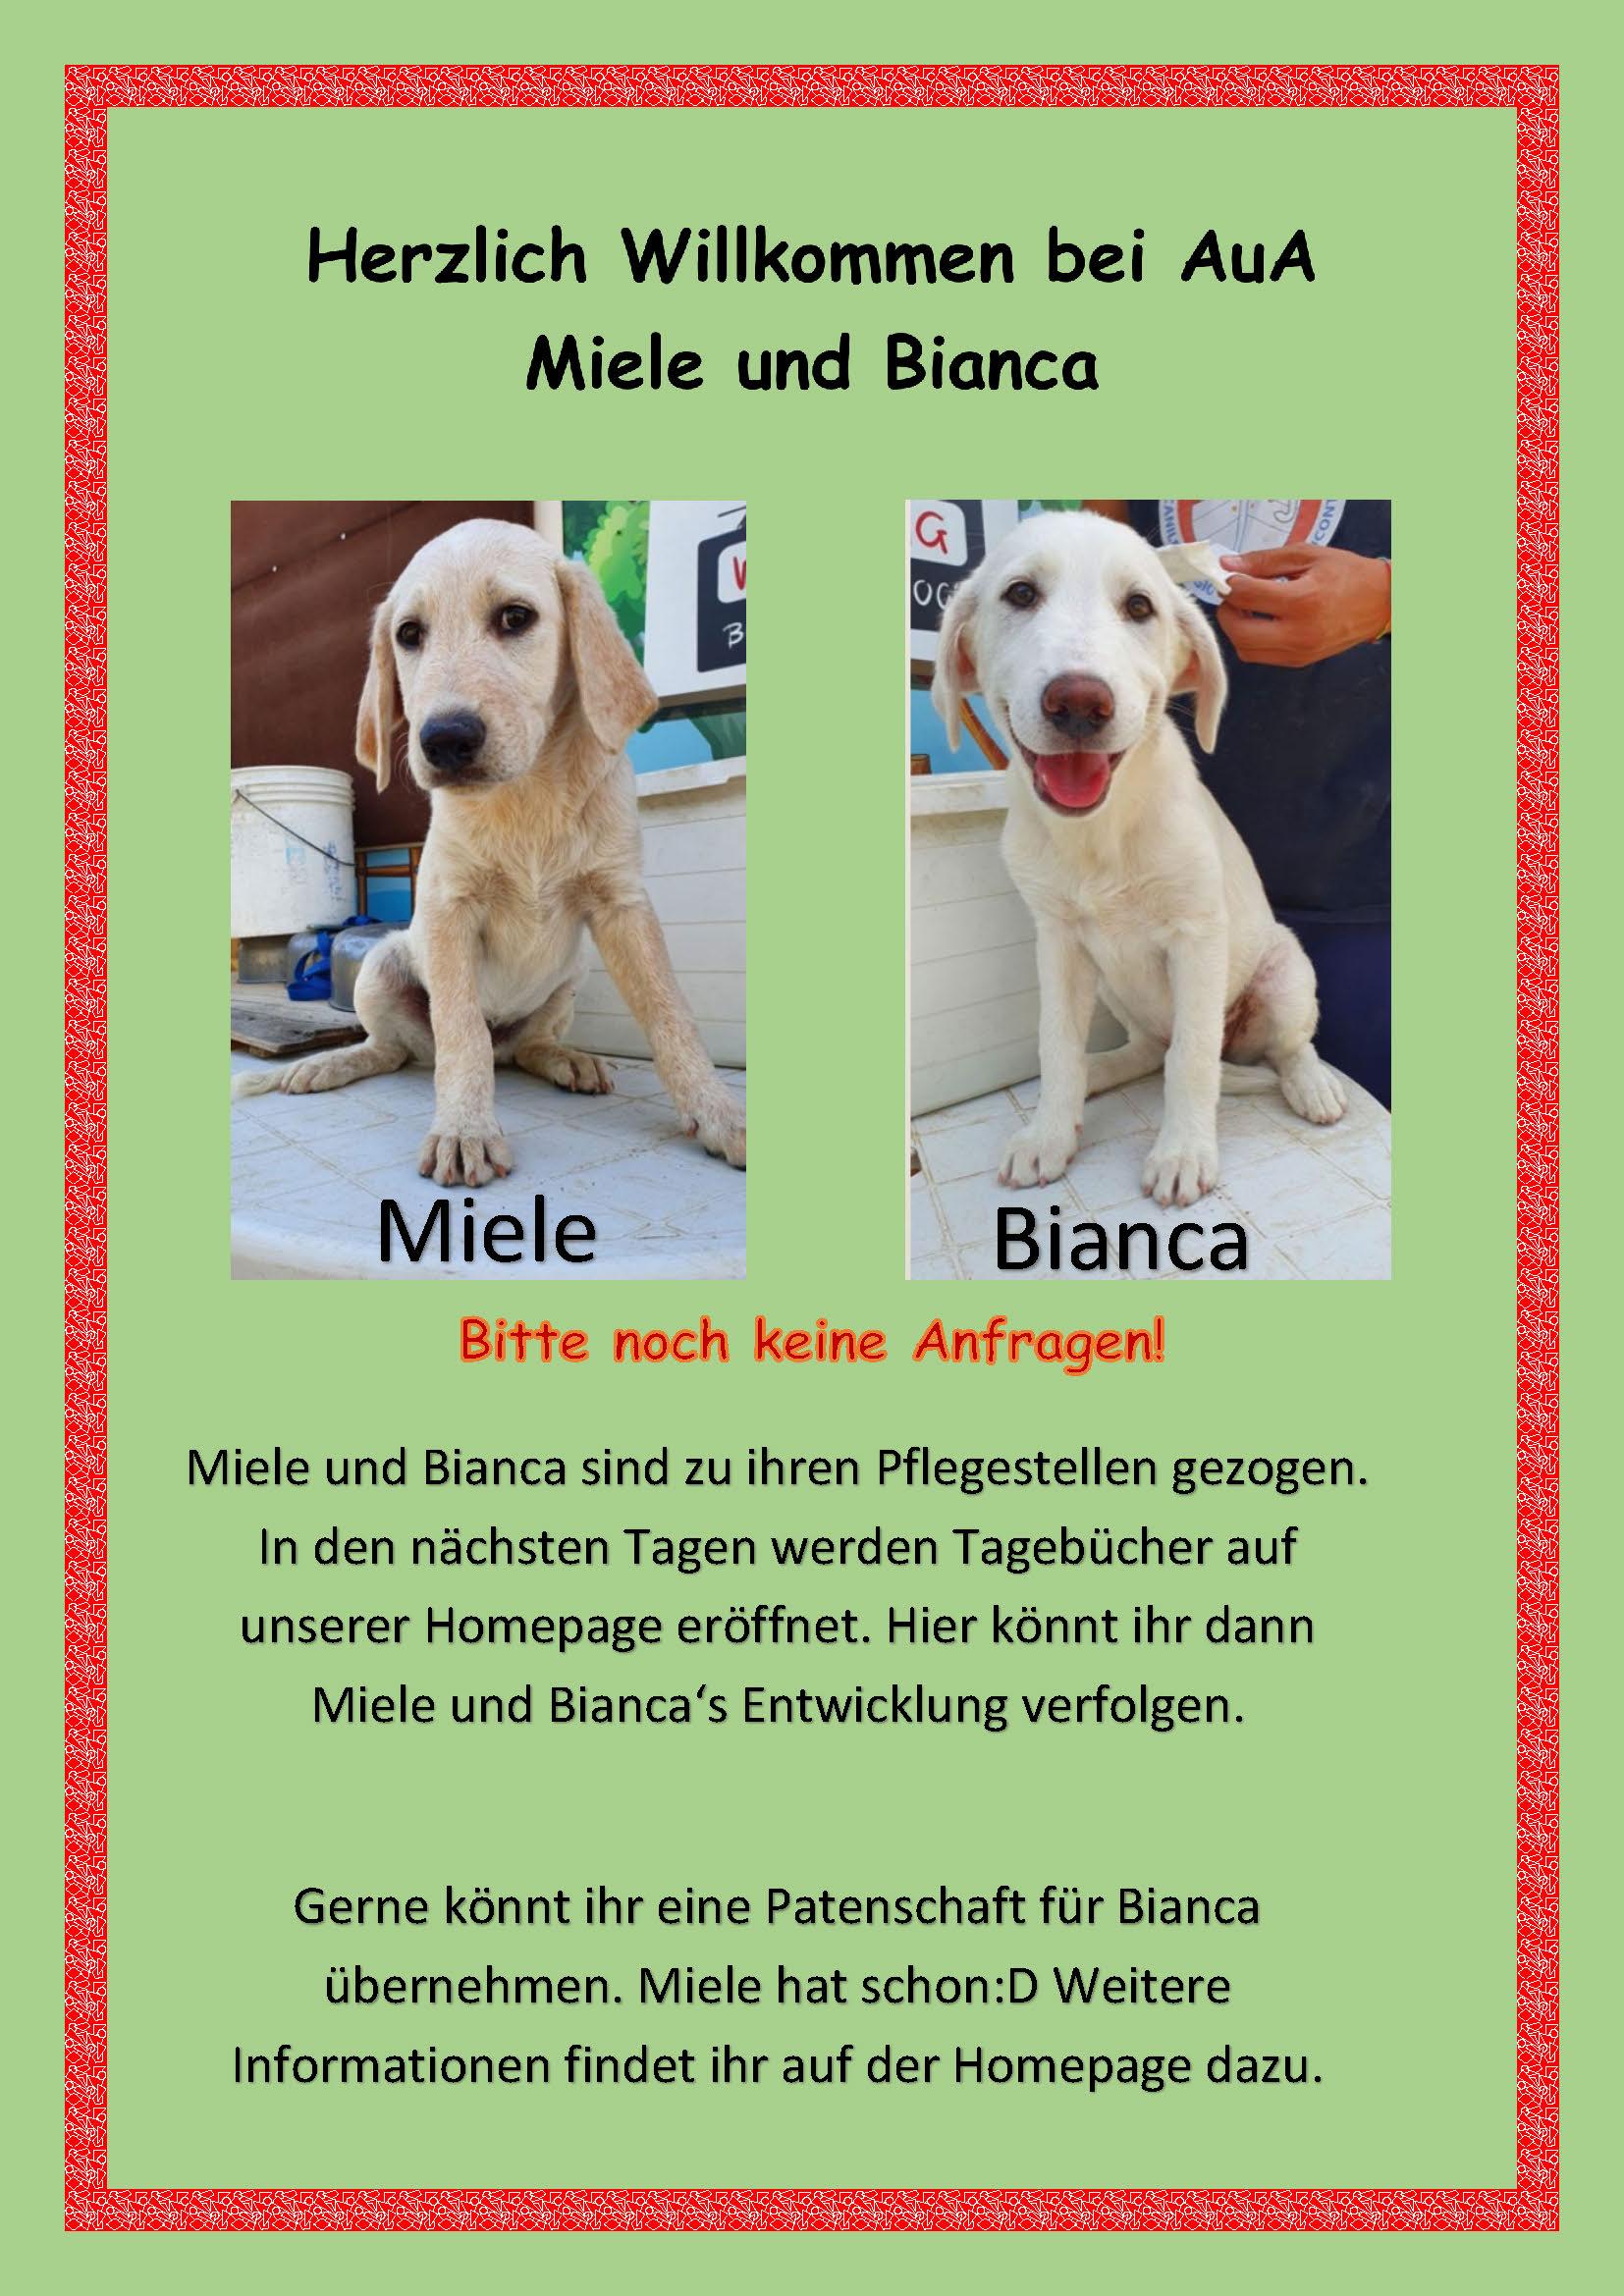 Hunde Miele und Bianca